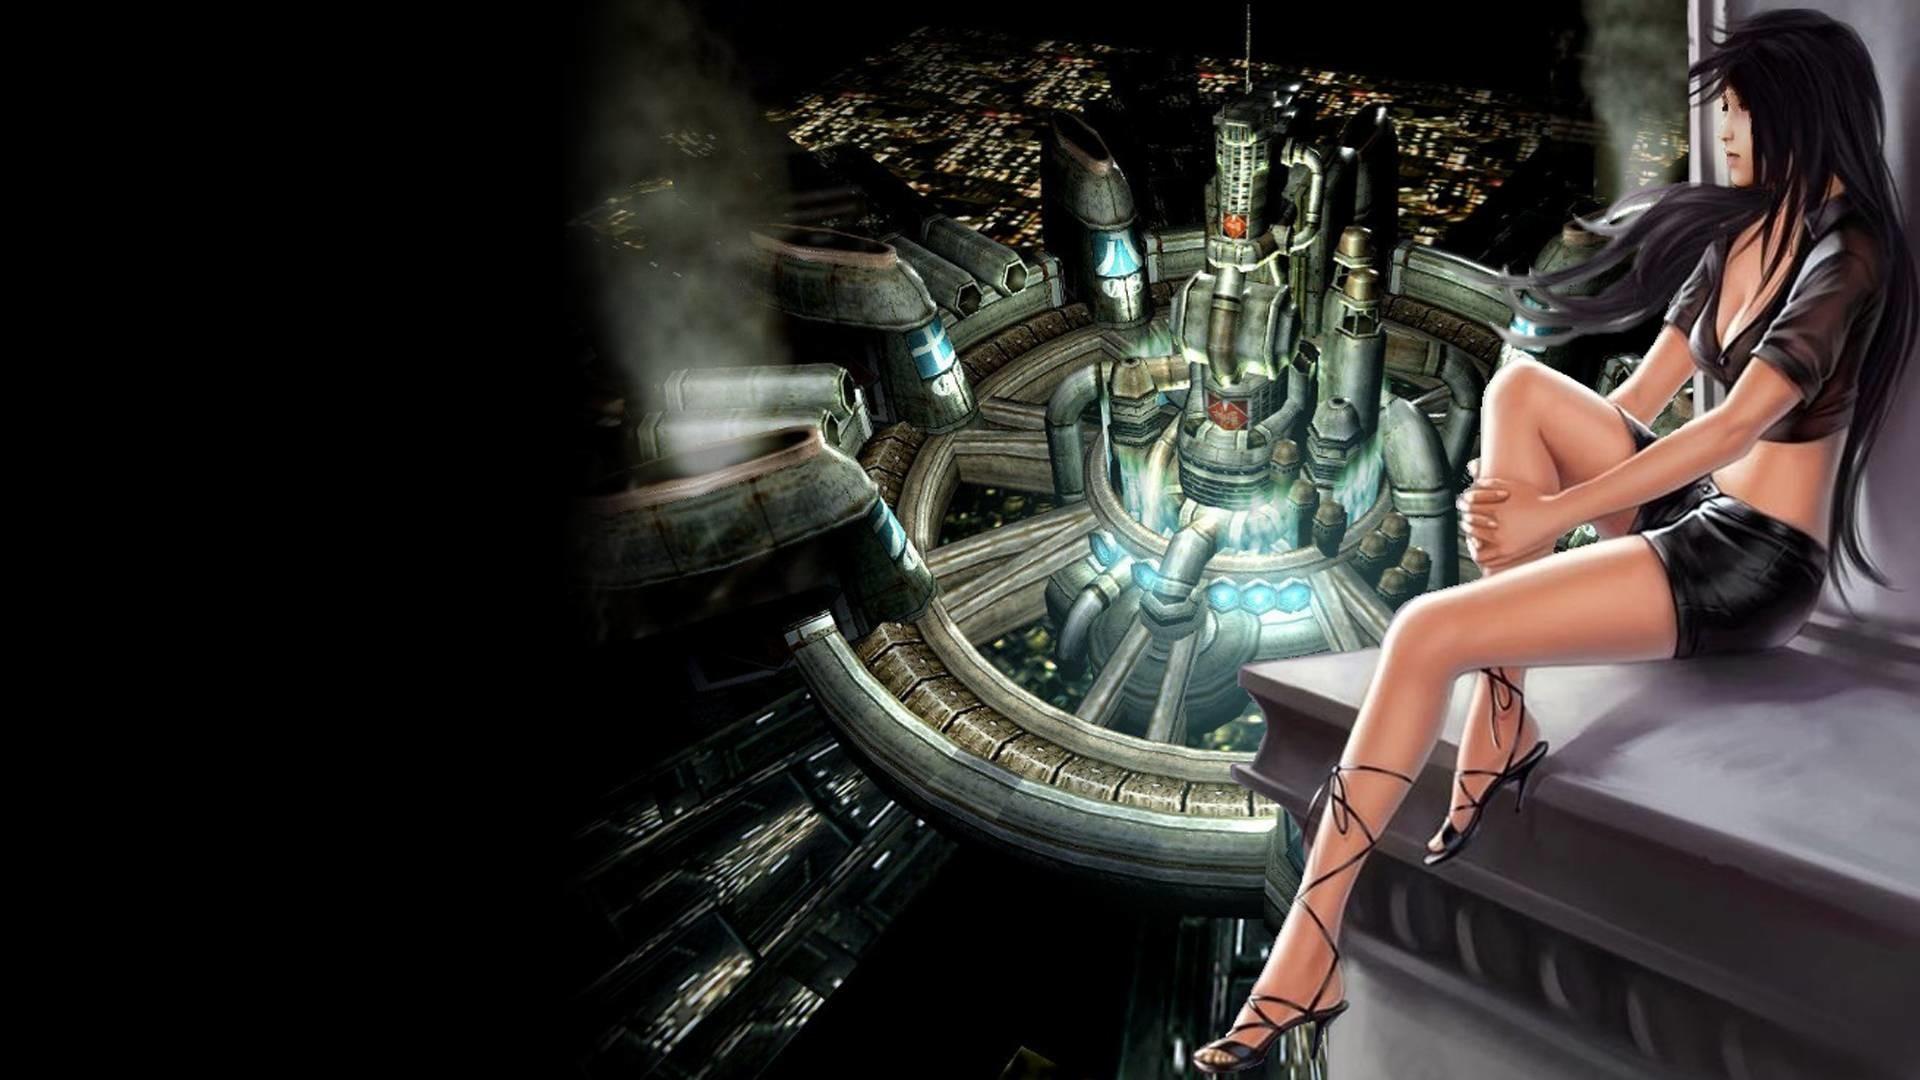 Final Fantasy 7 Wallpaper (75+ Images